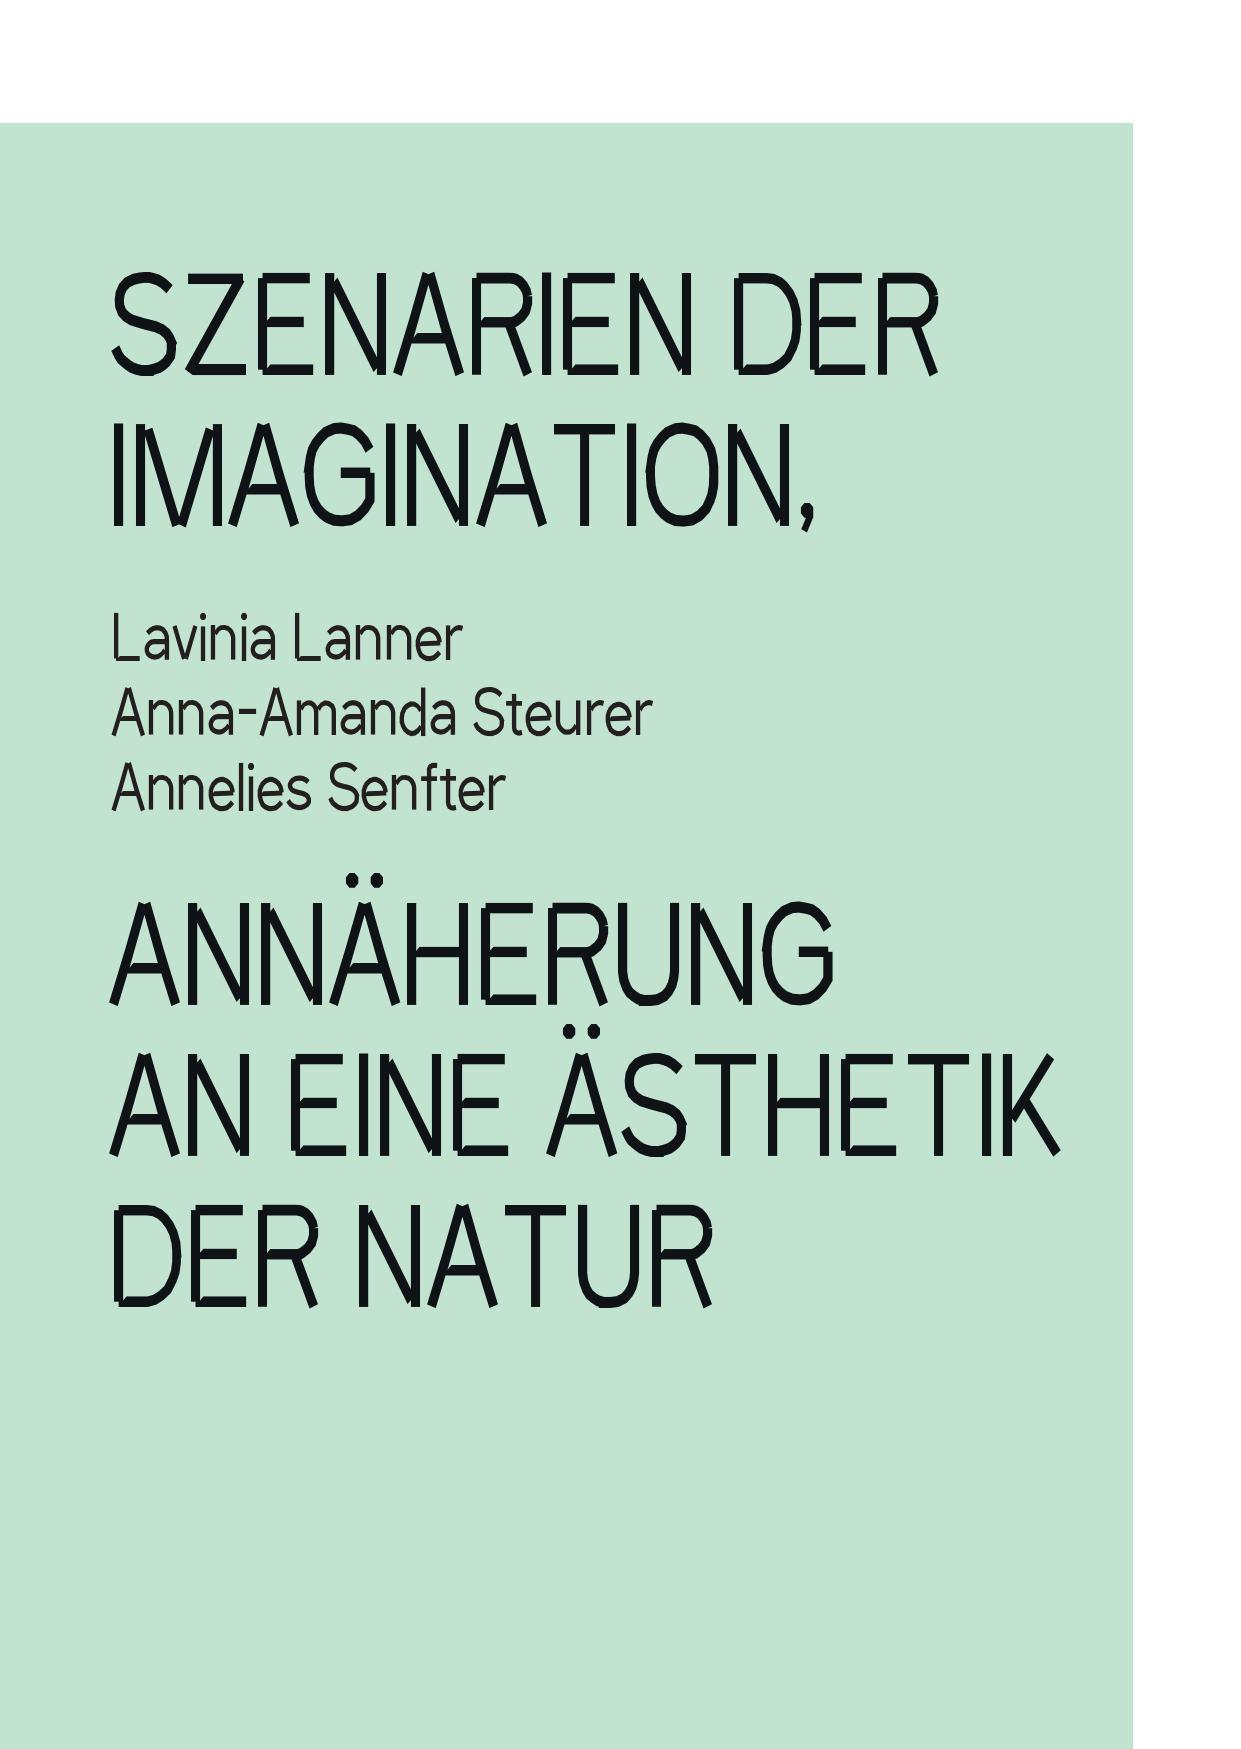 Szenarien der Imagination, Annäherung an eine Ästhetik der Natur